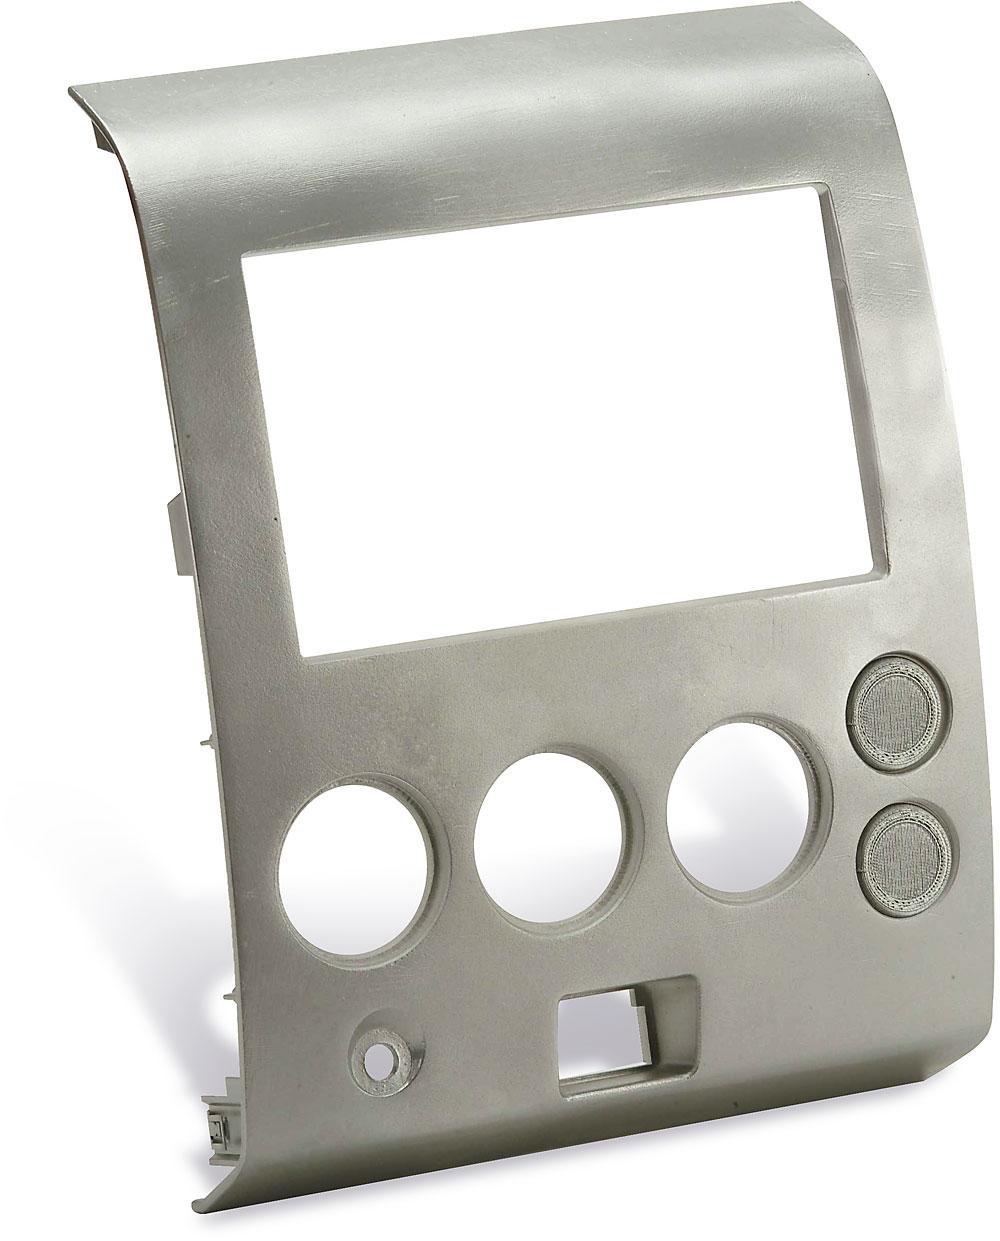 Metra 95 7406 dash kit fits 2004 07 nissan titan 2004 pathfinder 2005 07 armada double din radios at crutchfield com